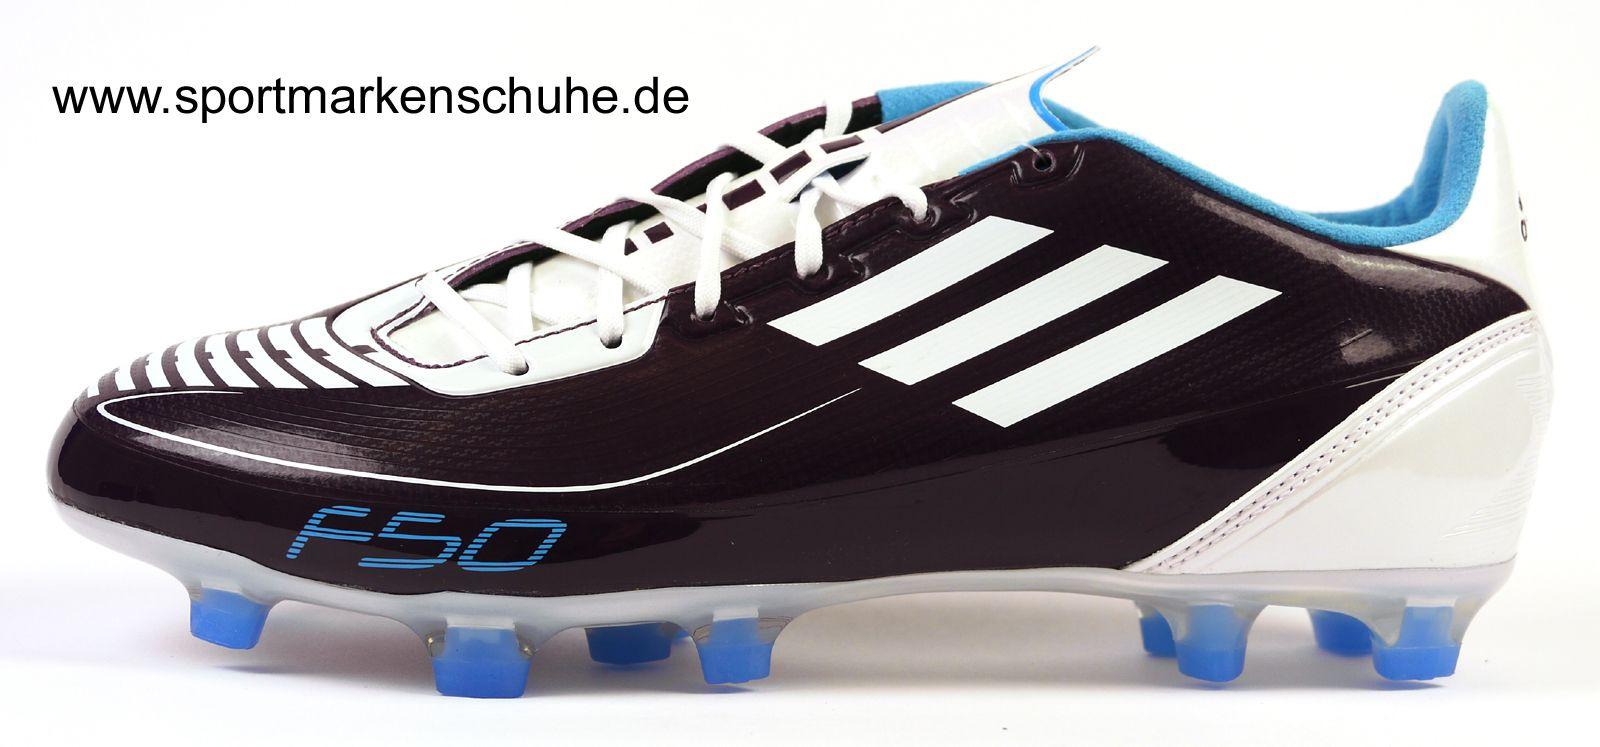 official photos 8685c b7a0b Adidas F30 TRX FG W Damen Fußballschuh  http   www.feine-produkte.de products adidas-f30 -trx-fg -w-gr-36-2-3-40-damen-fussballschuh-neu-ovp-897-de.html